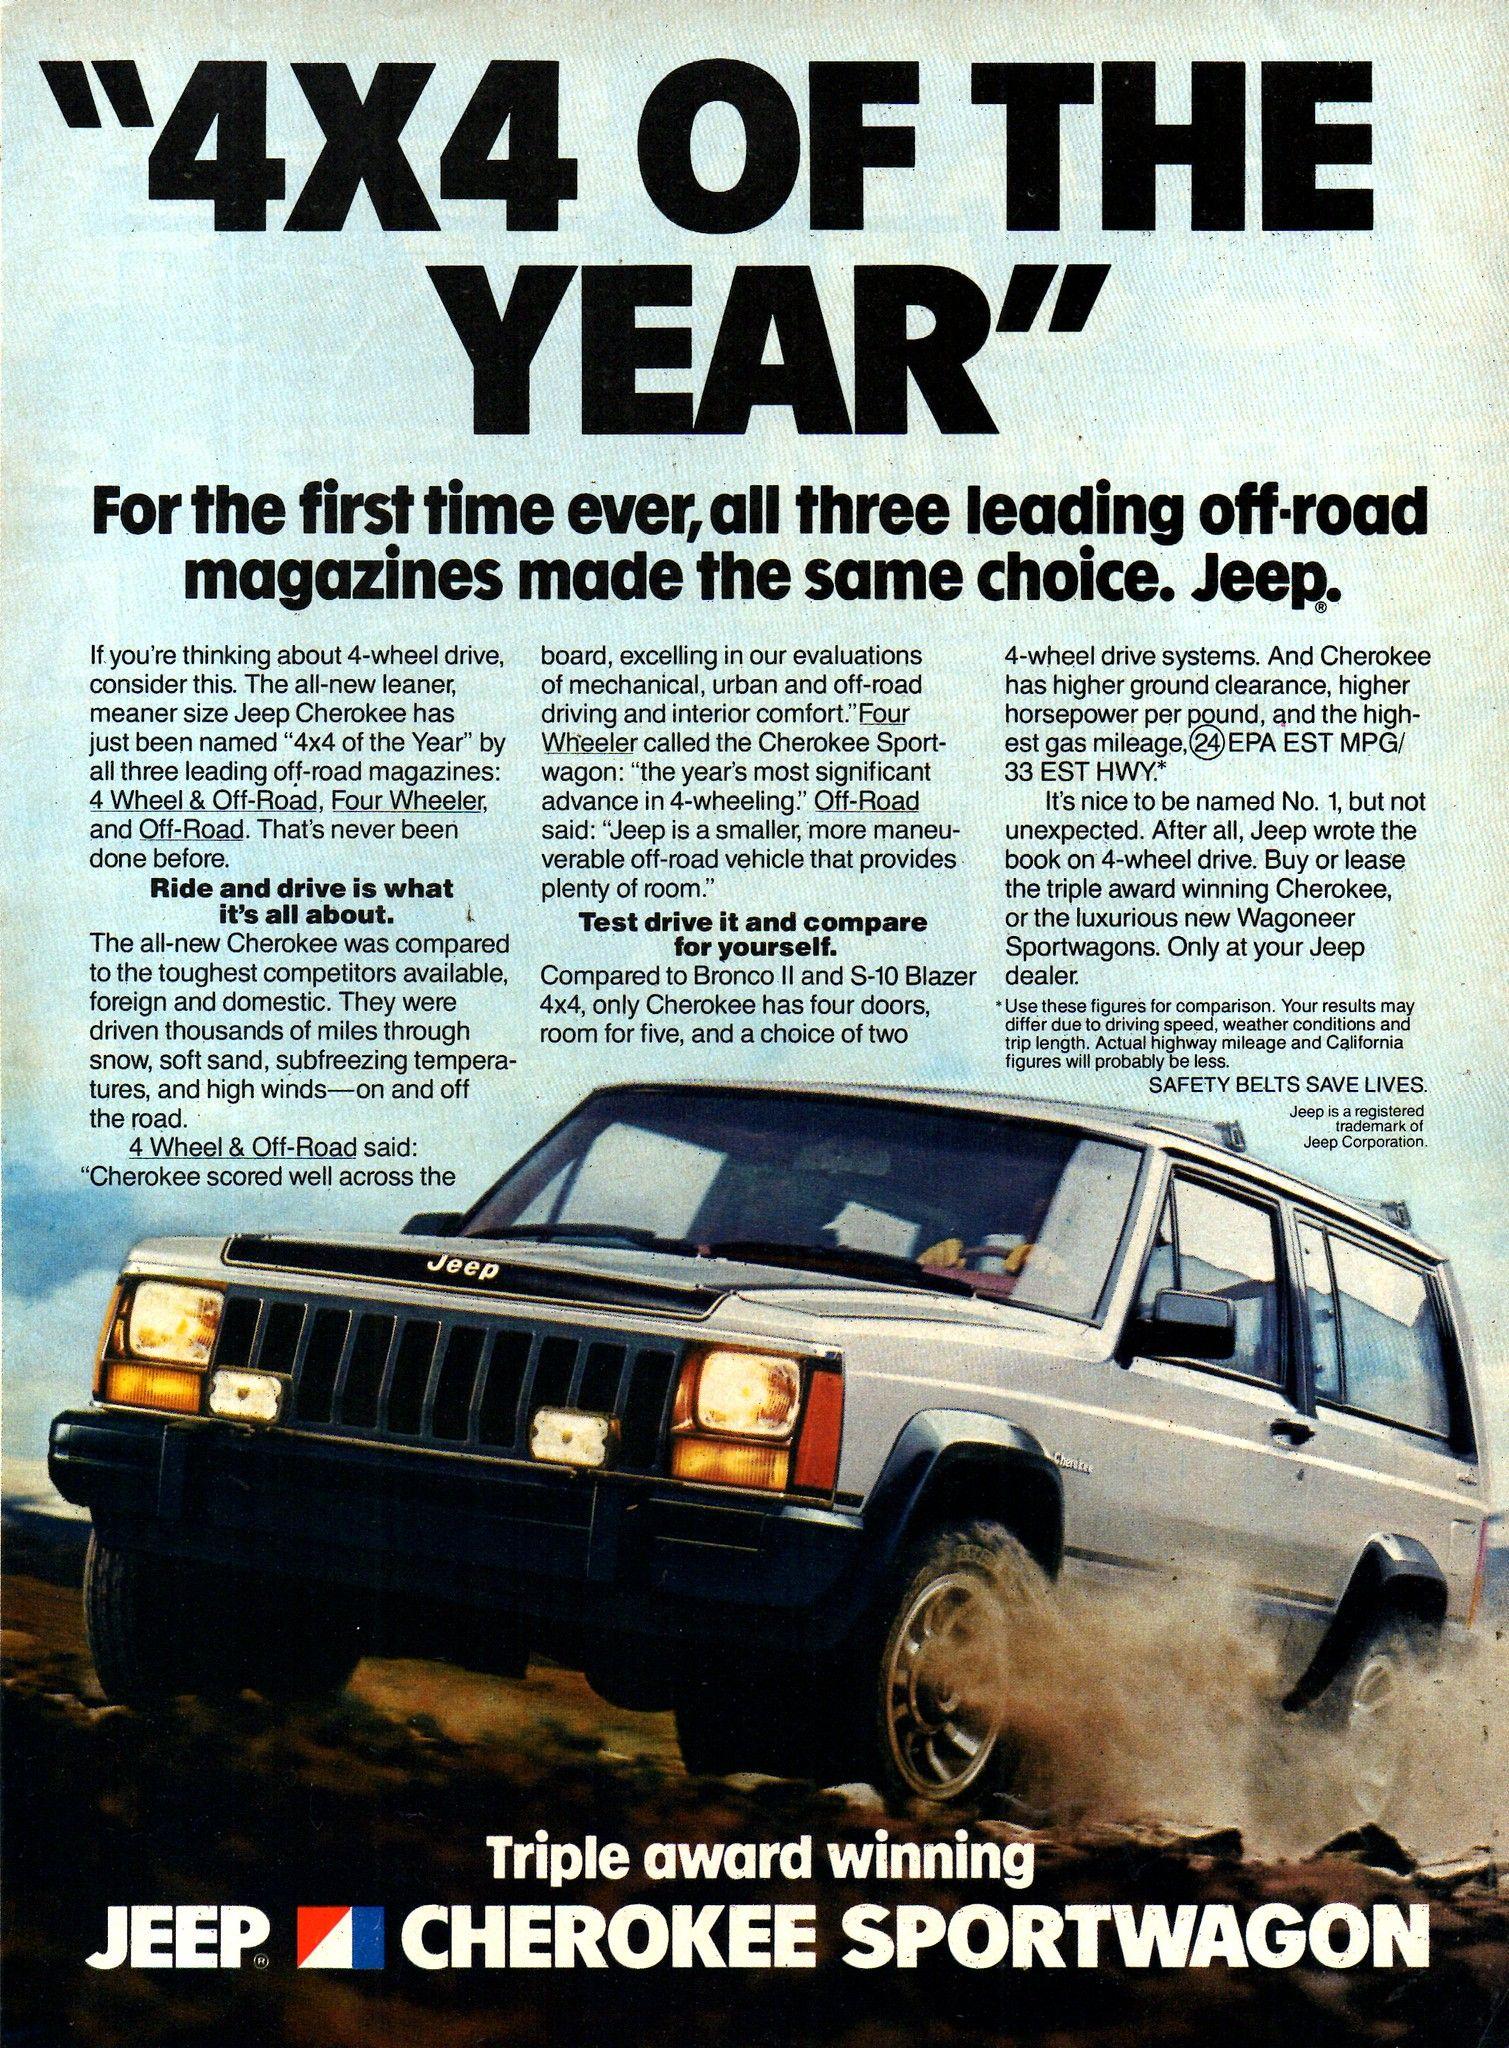 1984 Jeep Cherokee Sportwagon 4wd Wagon American Motors Usa Original Magazine Advertisement Jeep Cherokee Jeep Jeep Cherokee Xj